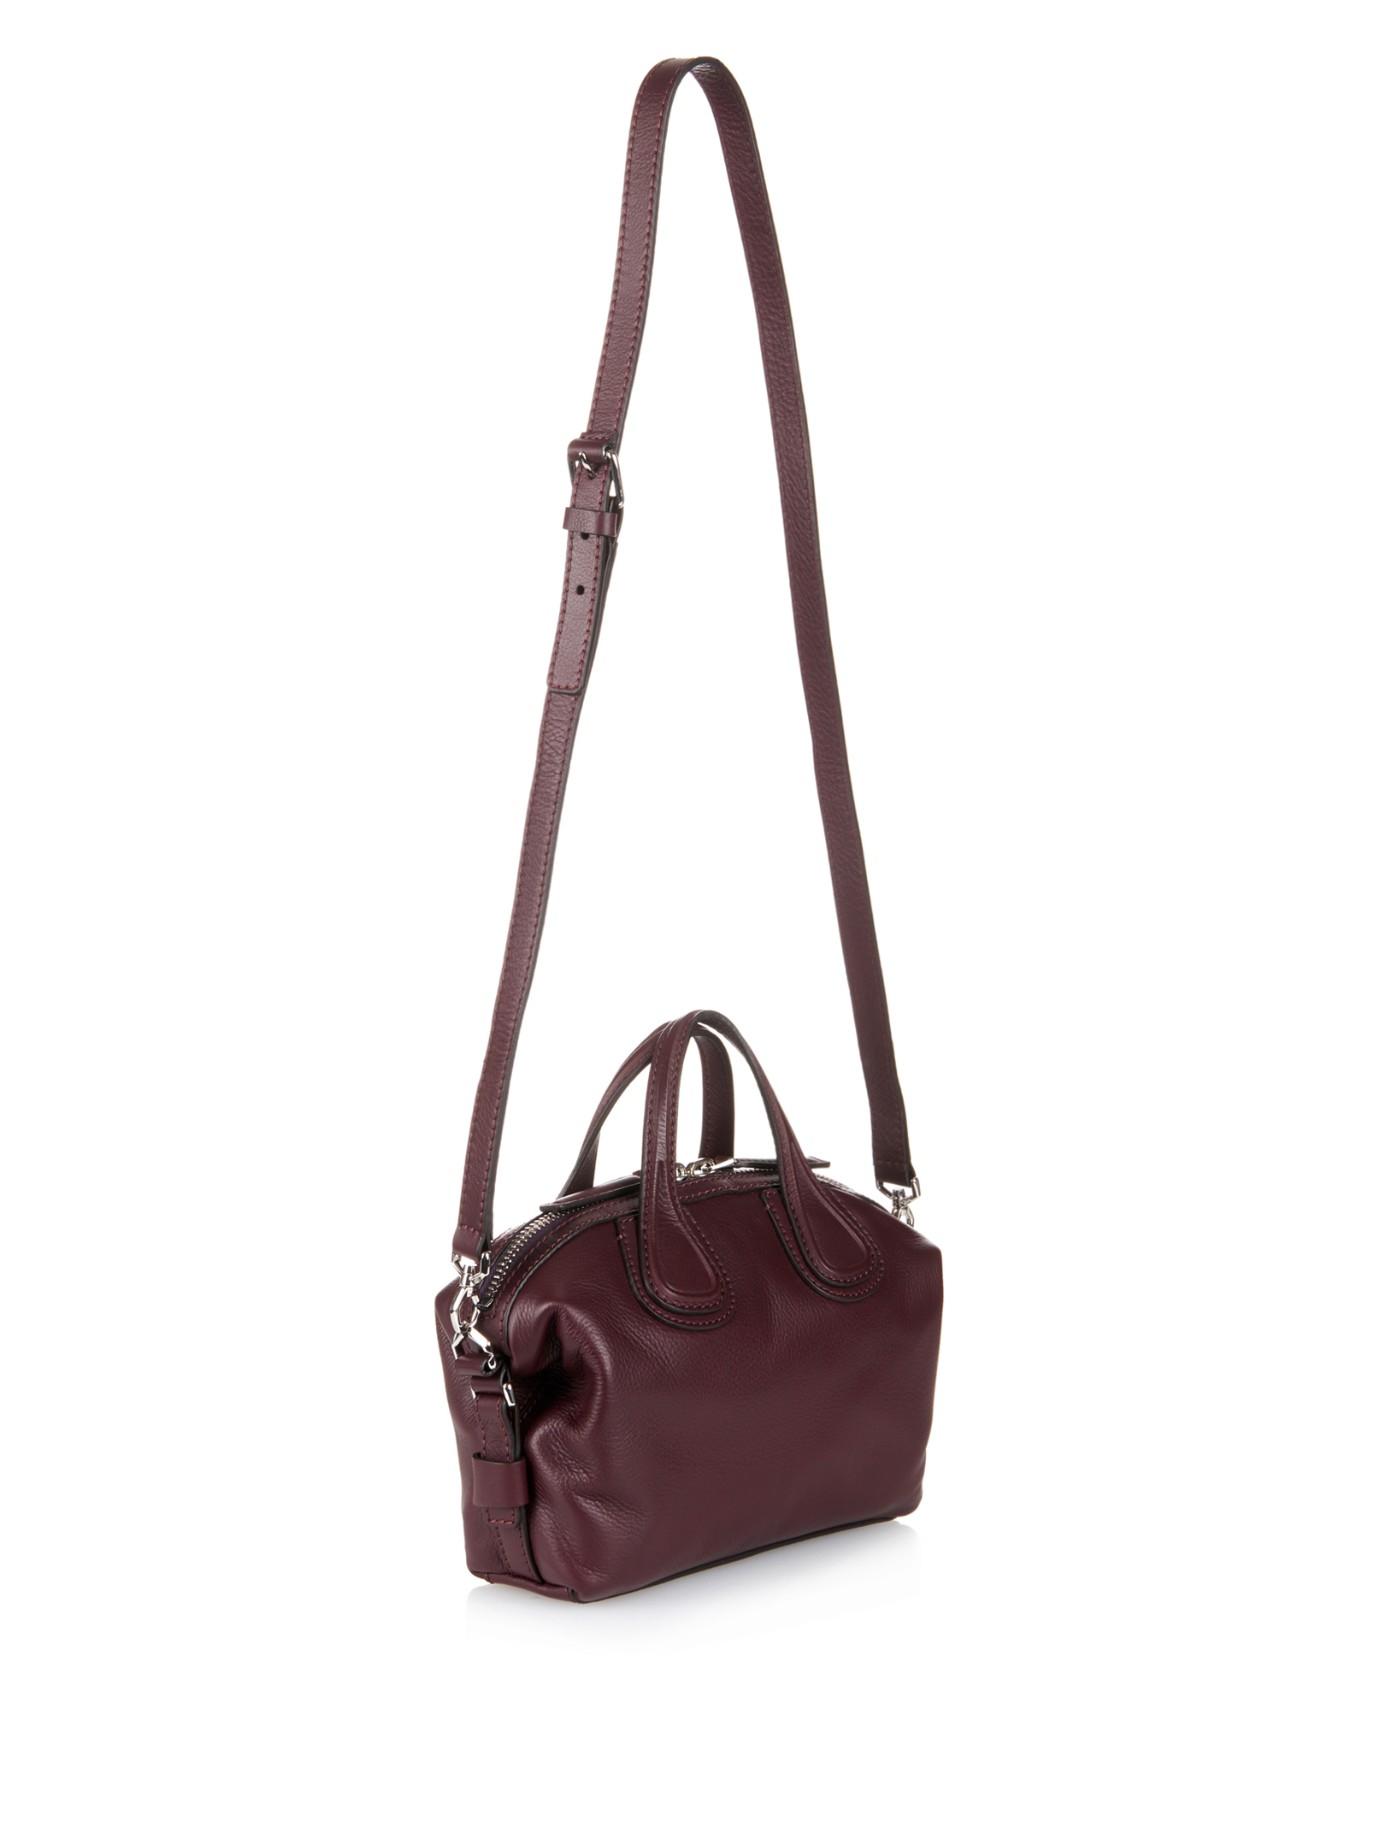 373633c36cbb Lyst - Givenchy Nightingale Mini Leather Cross-Body Bag in Purple